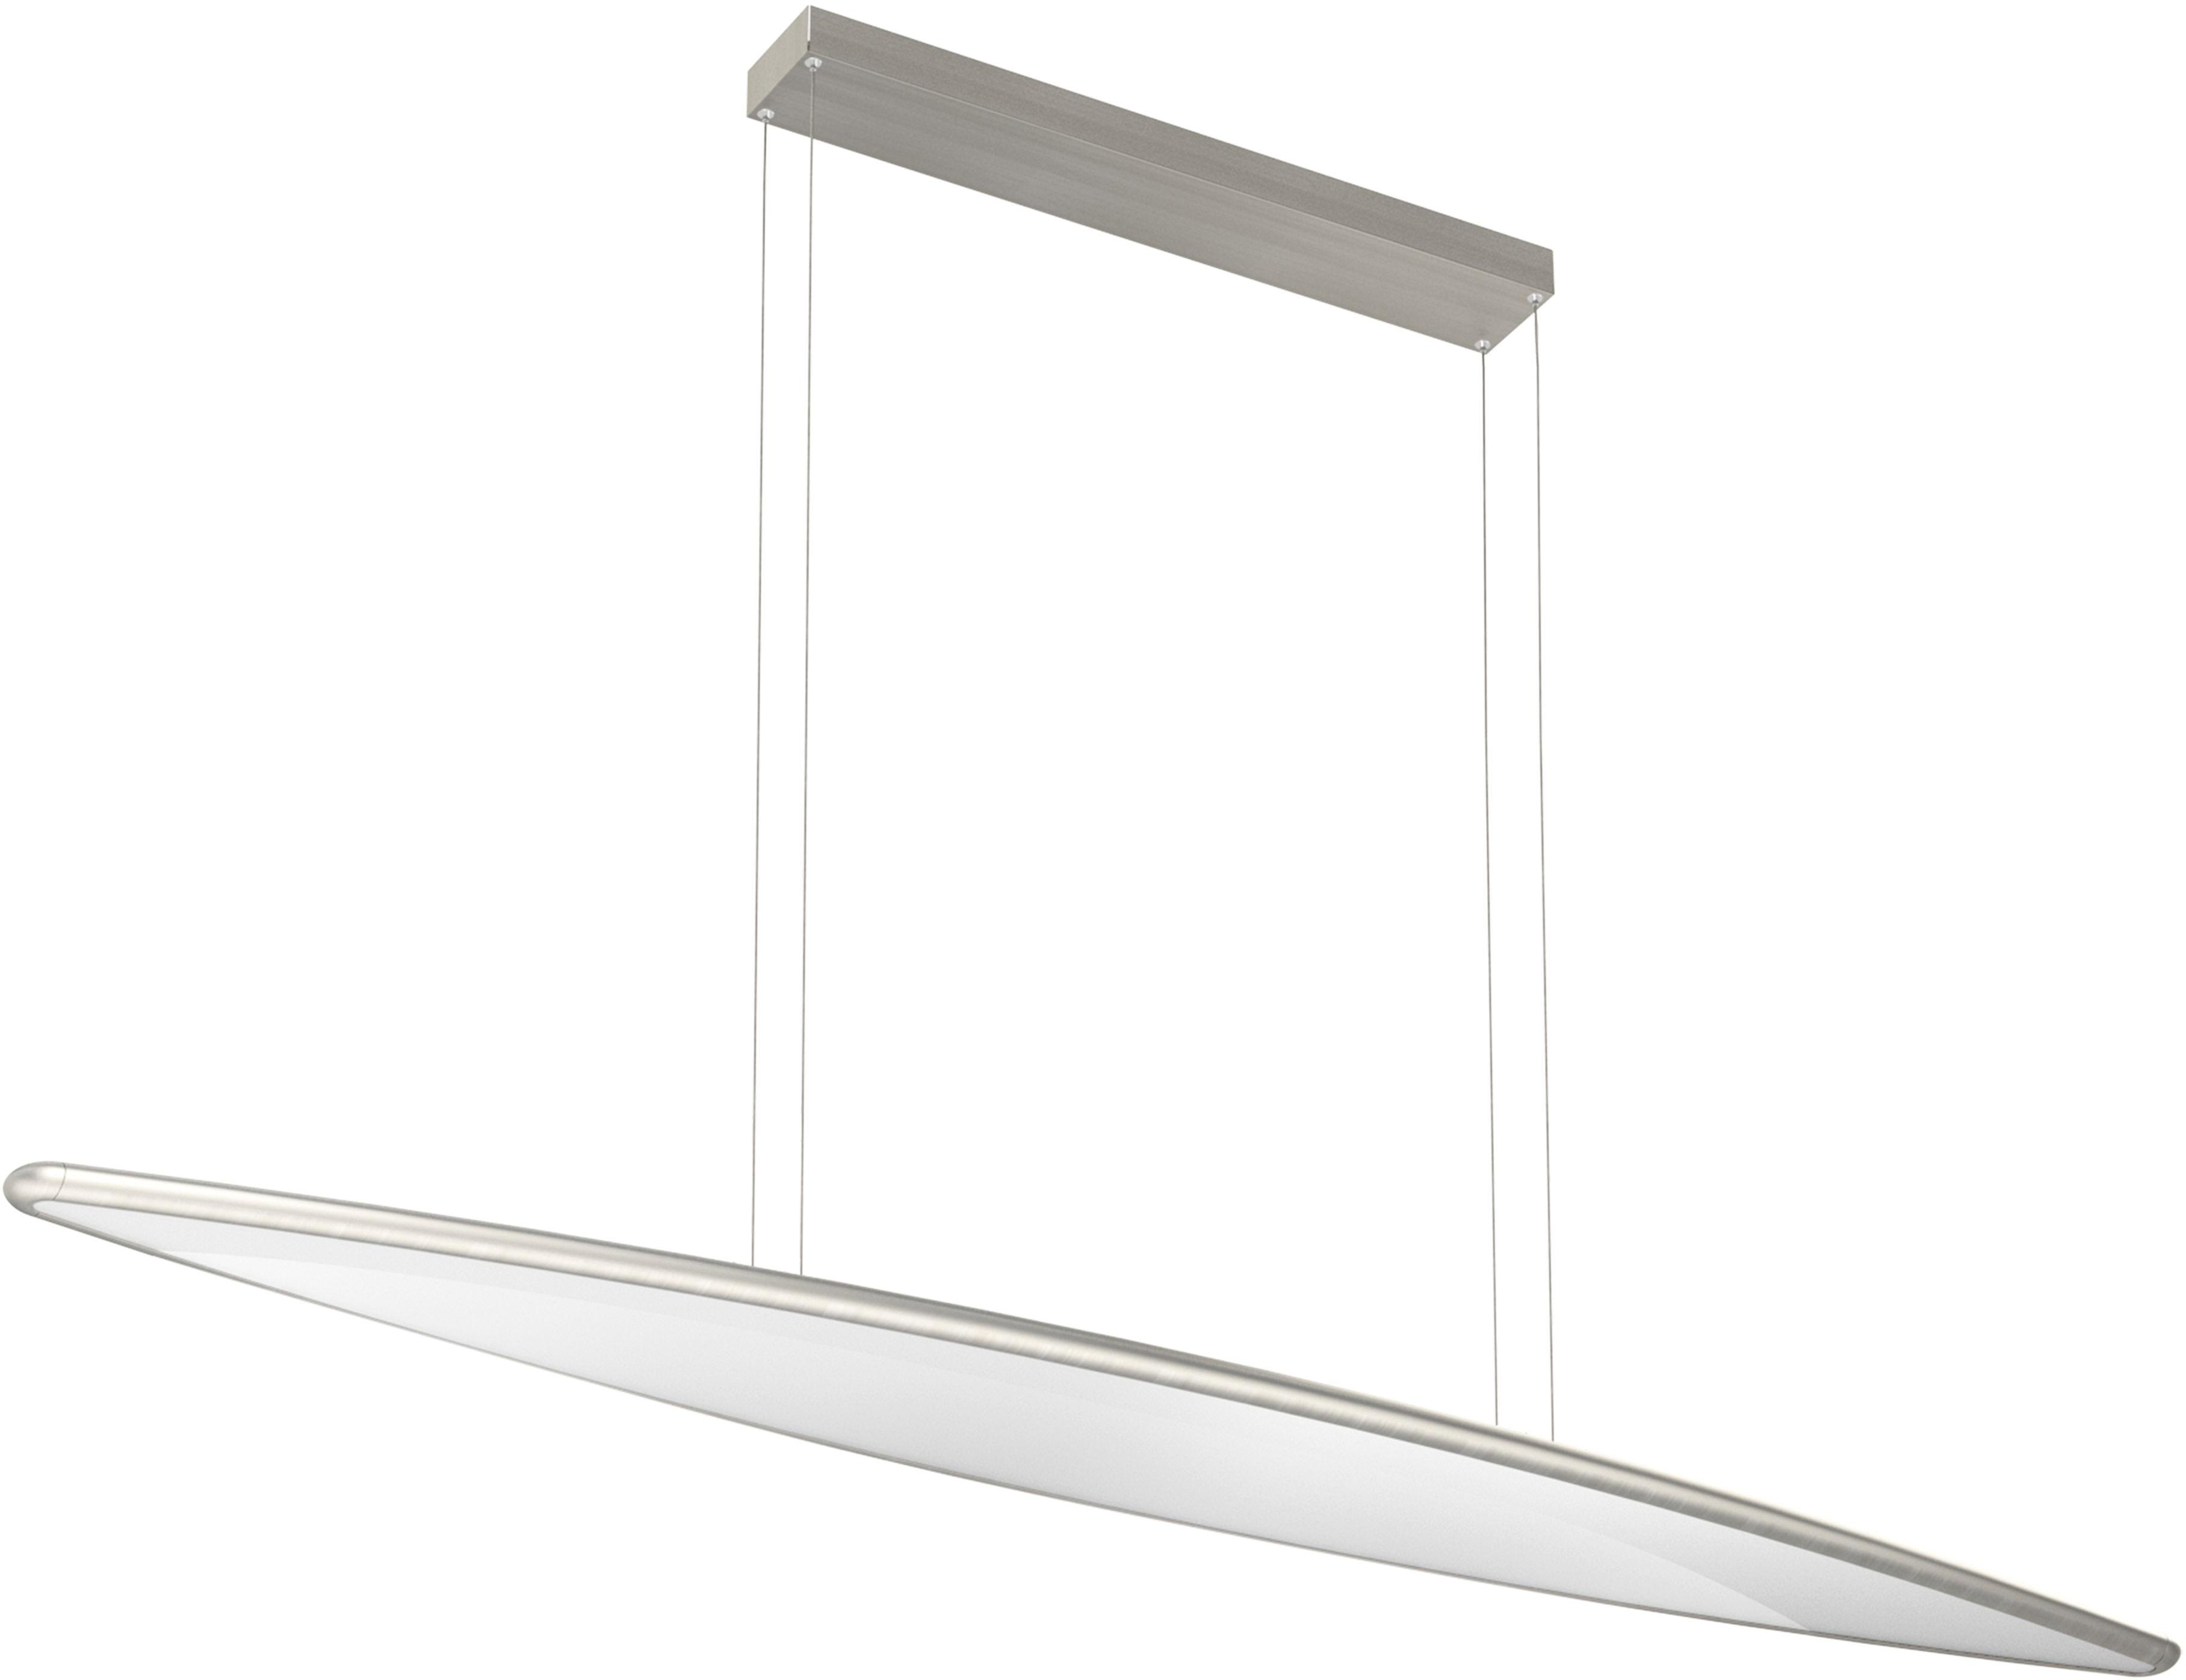 EVOTEC LED Pendelleuchte SKY OVAL, LED-Board, Warmweiß-Neutralweiß-Tageslichtweiß, LED Hängelampe, LED Hängeleuchte, Farbwechsel